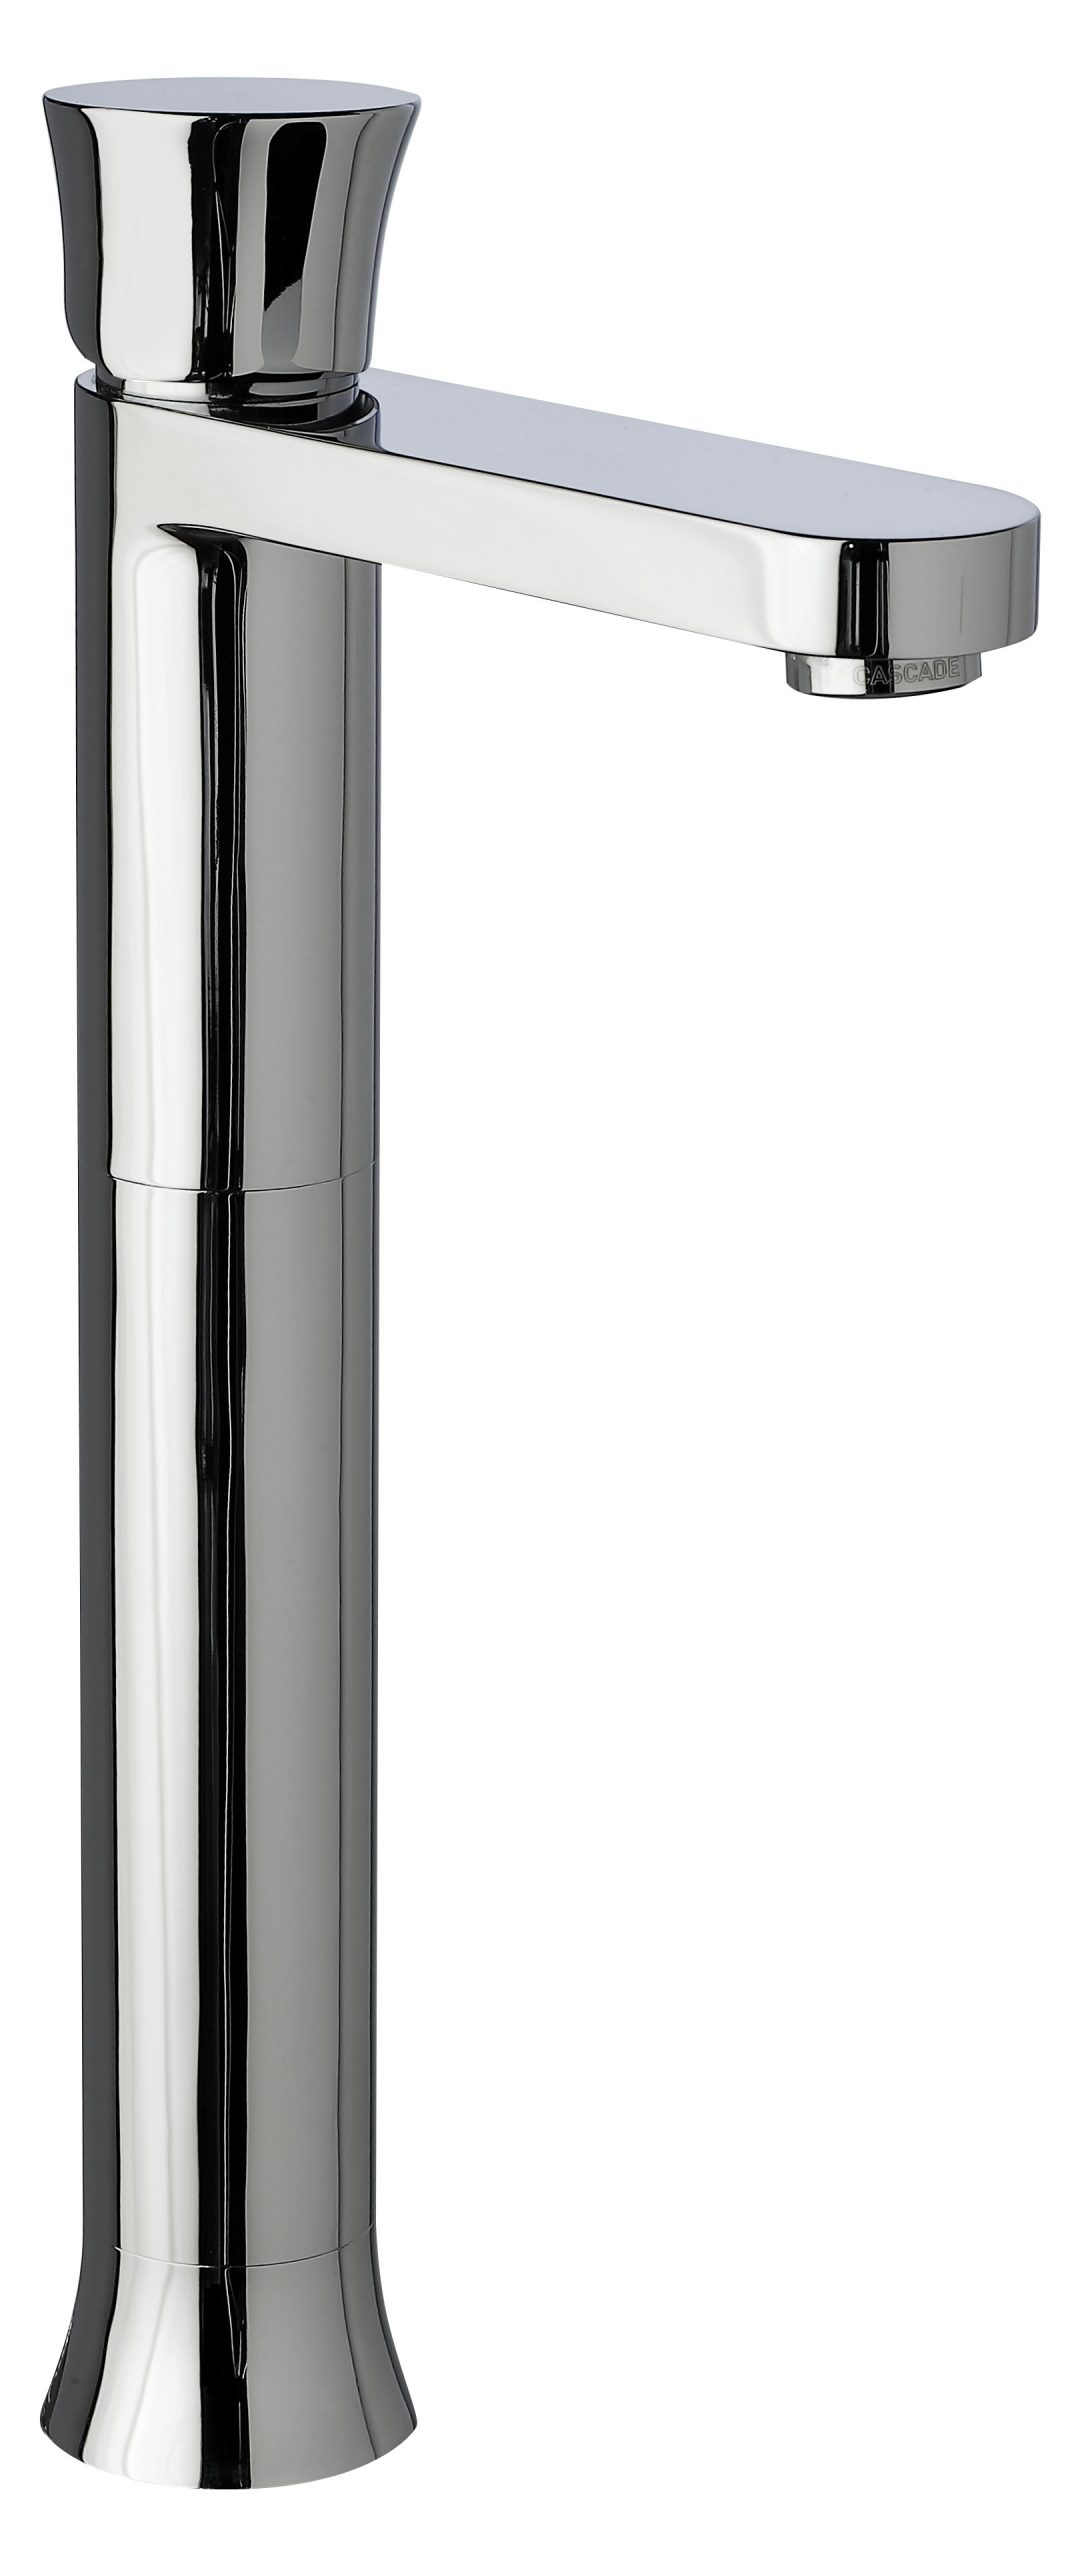 Maier Muse Tall Single Hole Lav - 66.104